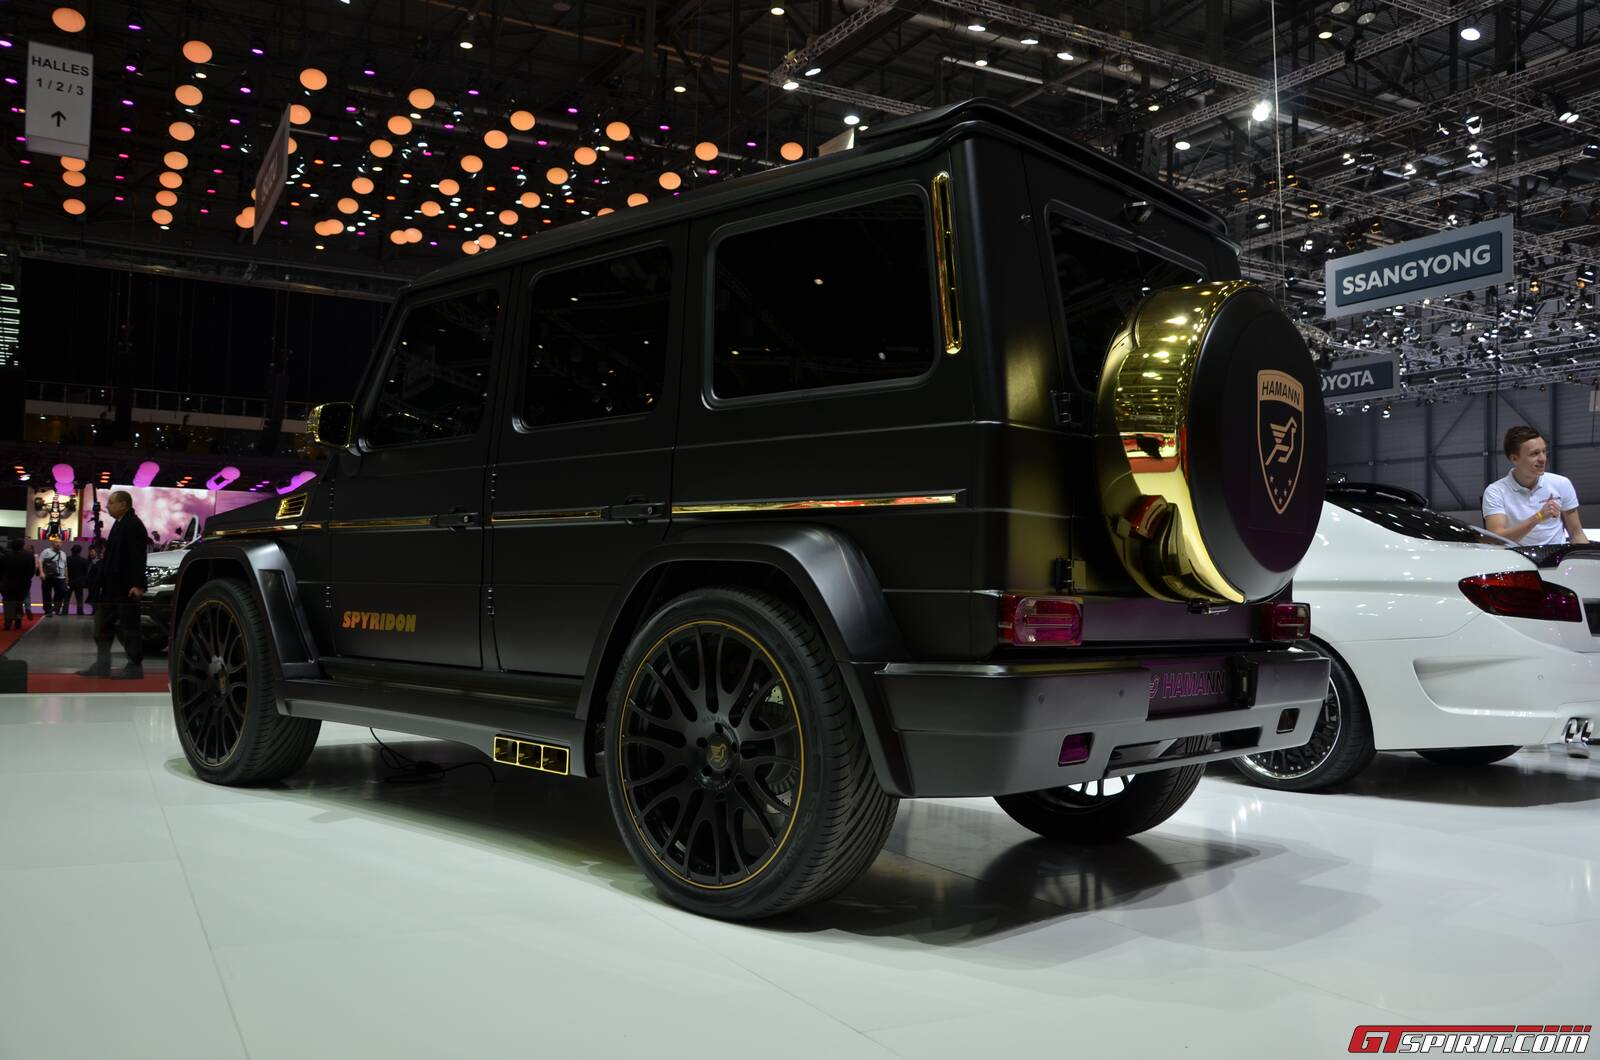 2013 hamann mercedes benz g 65 amg spyridon auto design tech. Black Bedroom Furniture Sets. Home Design Ideas